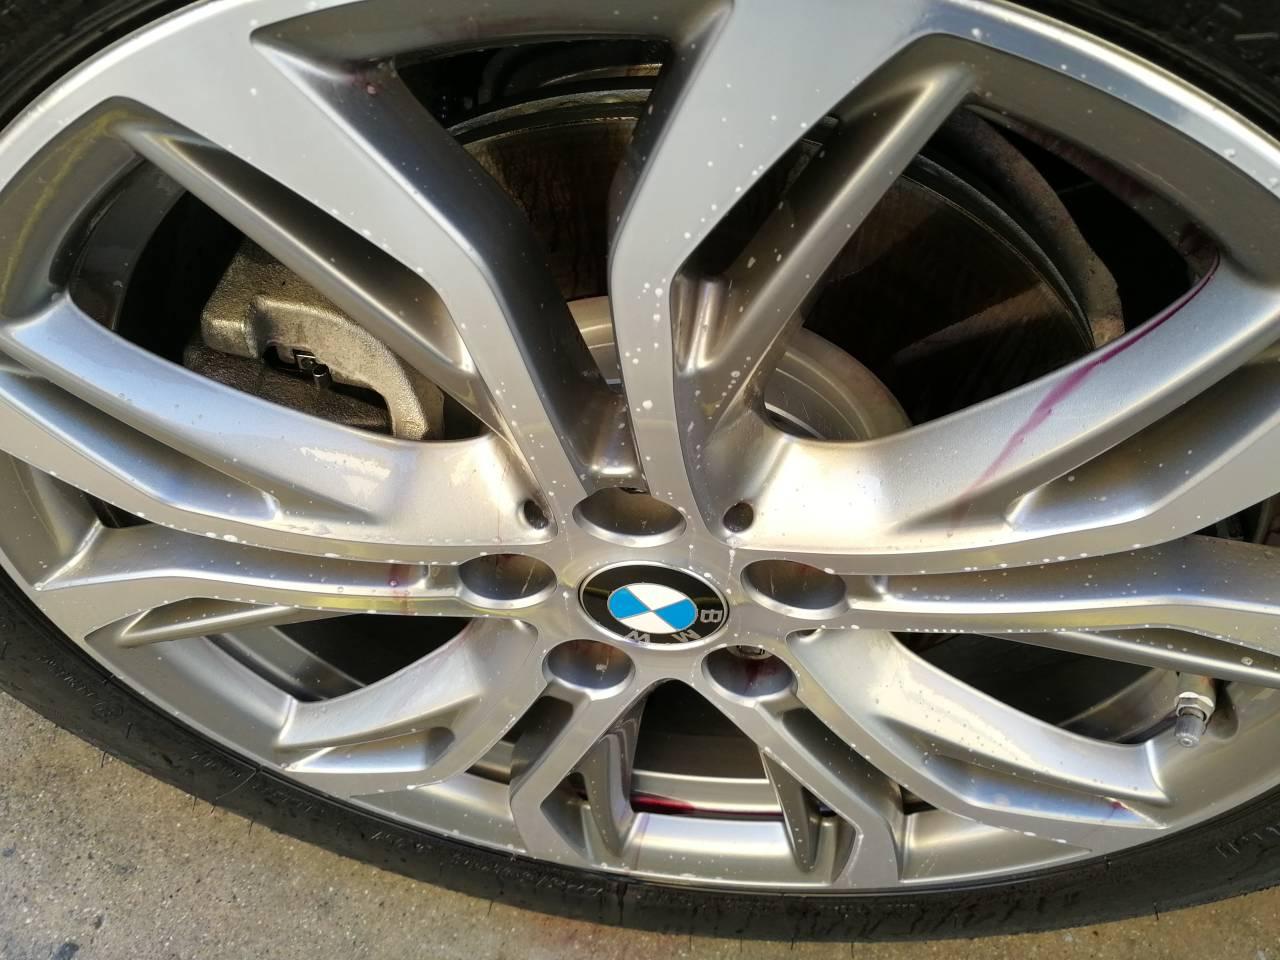 Bbriccardo - BMW X1 25D, appena uscita dalla concessionaria :)  D0343211e88f31ac3e23e5048aa917cb